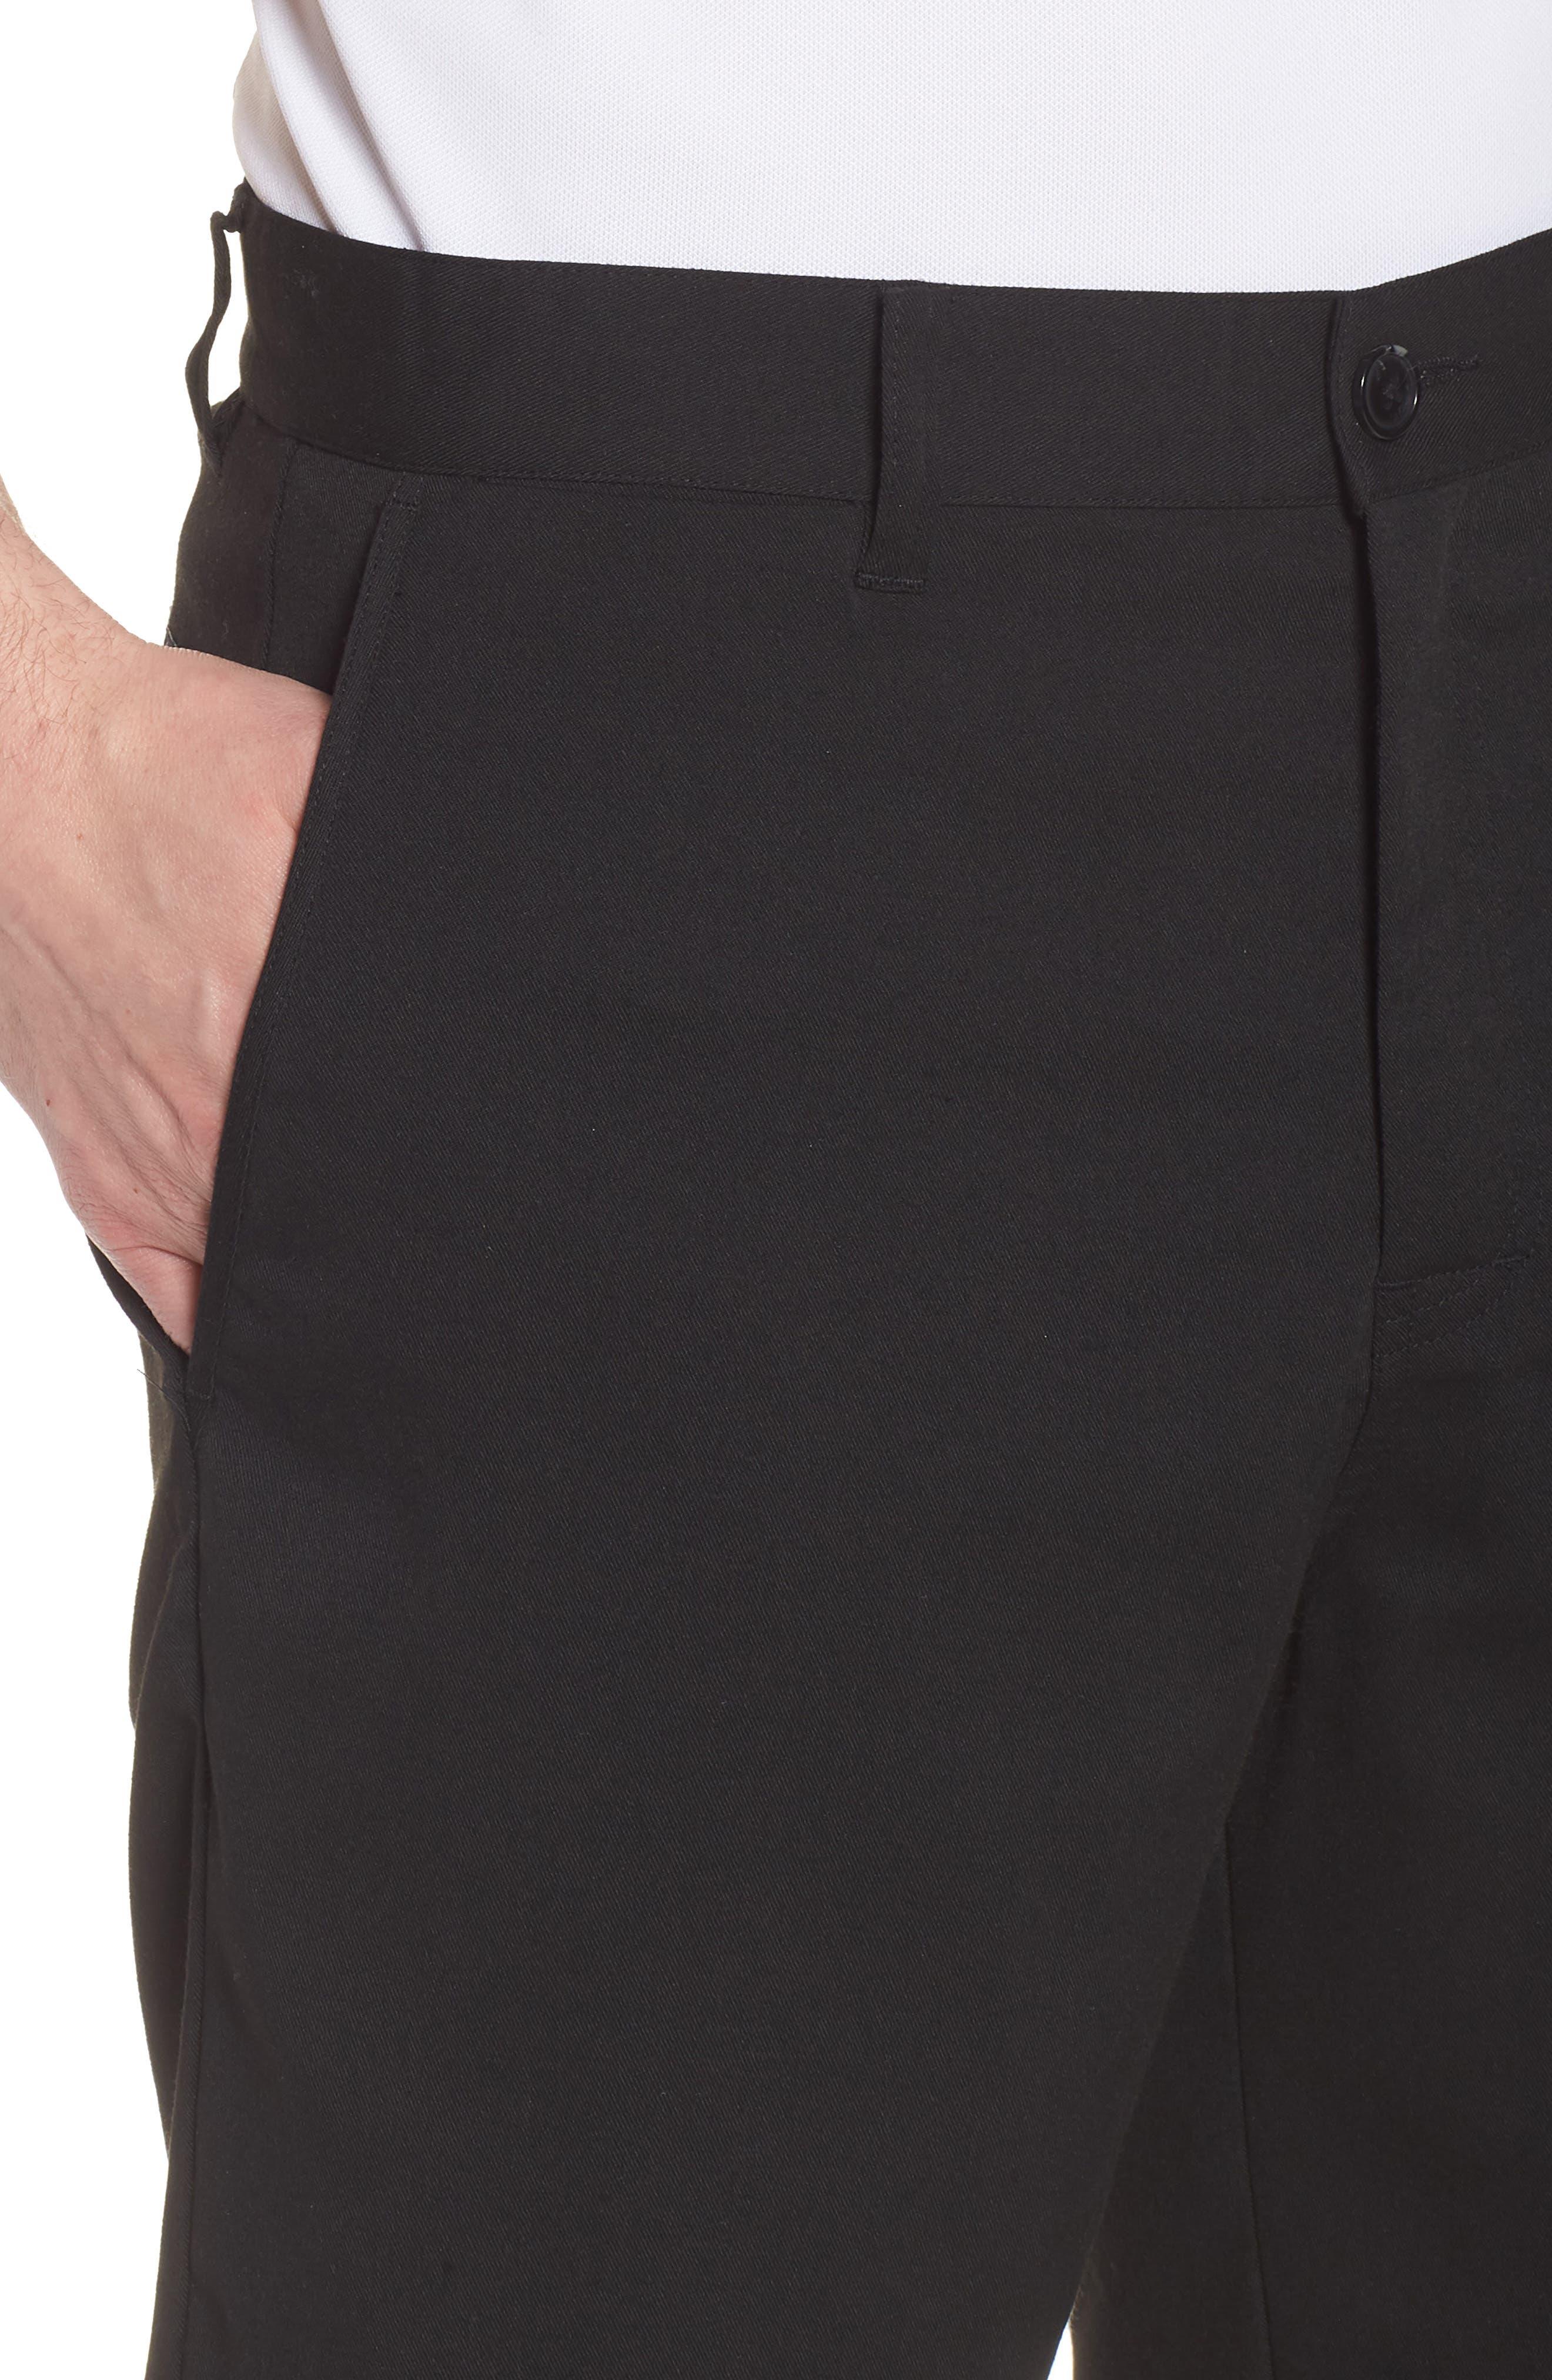 Puebla Stretch Shorts,                             Alternate thumbnail 4, color,                             BLACK